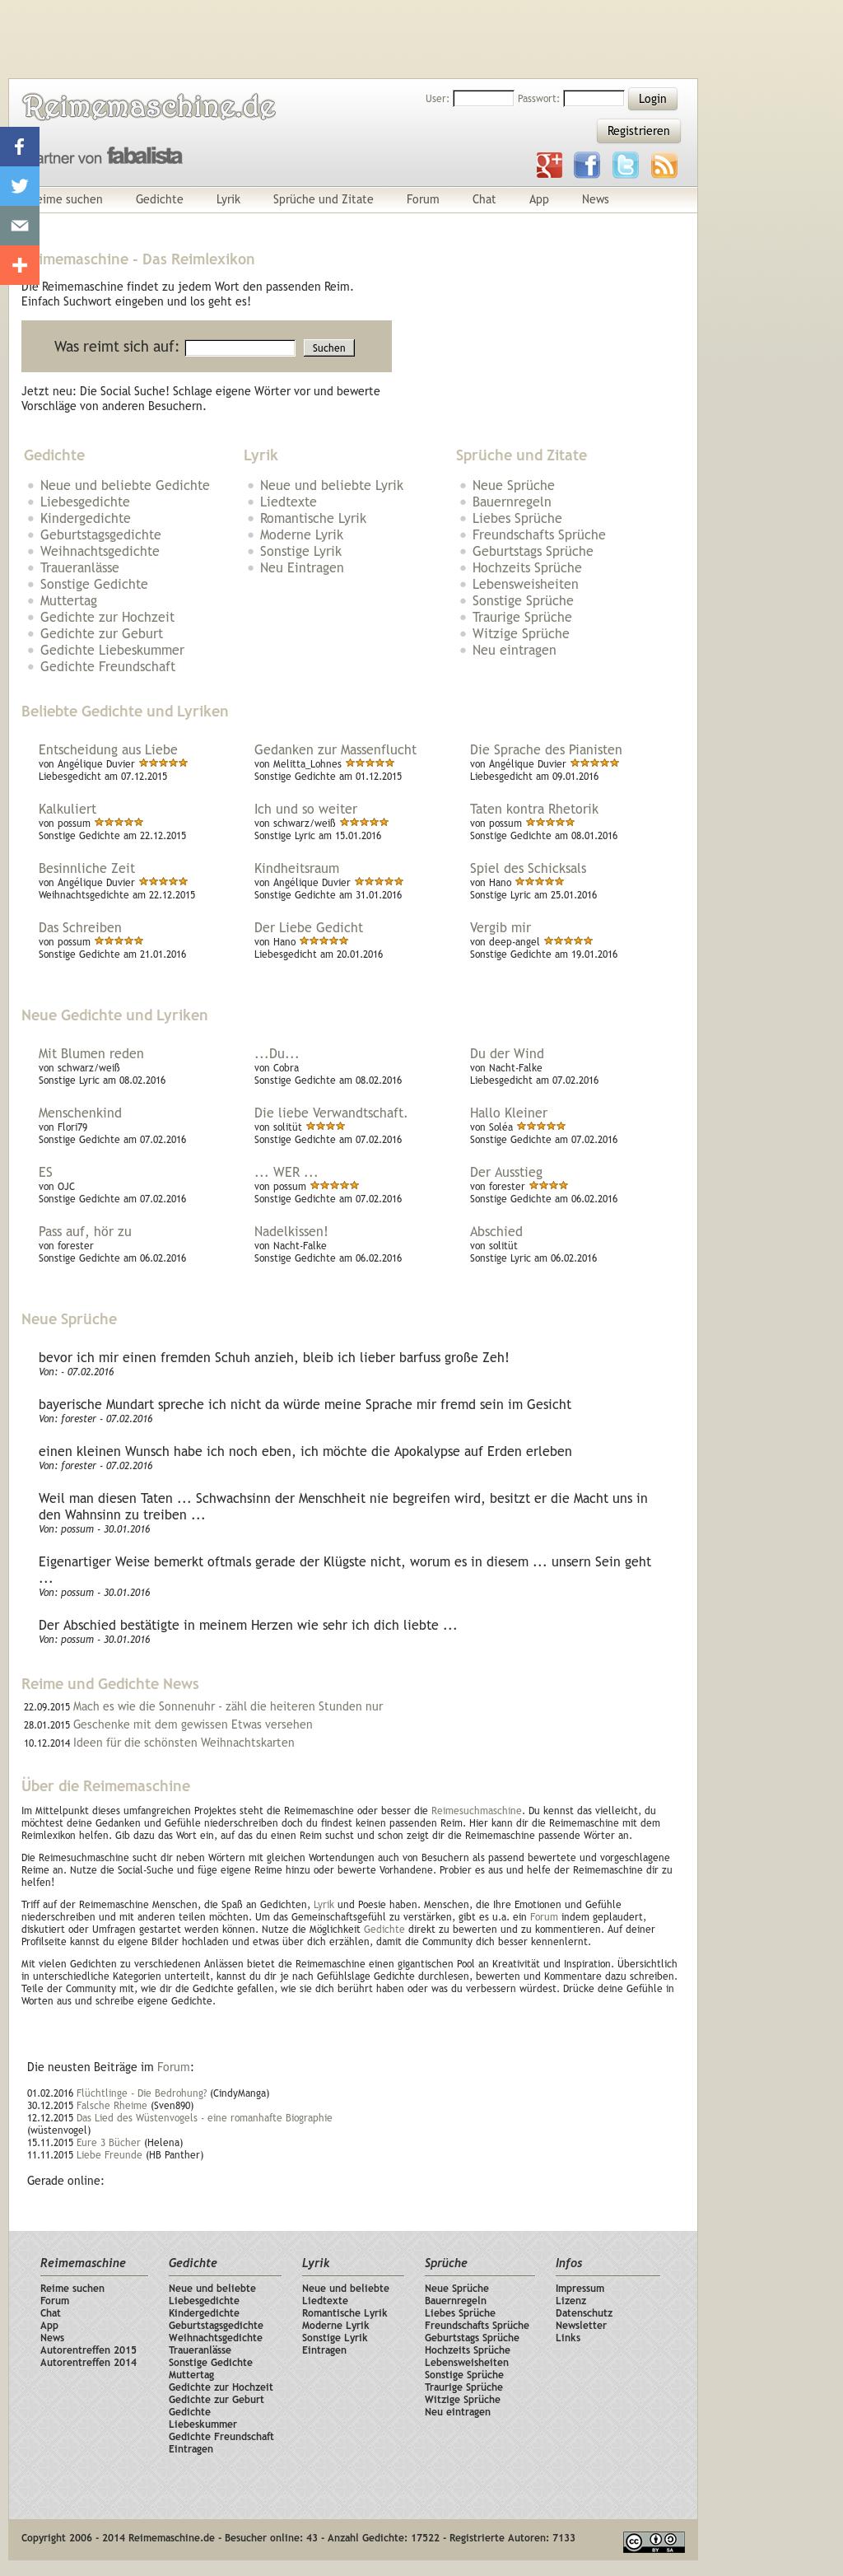 Weihnachtsgedichte Mundart.Reimemaschine De Competitors Revenue And Employees Owler Company